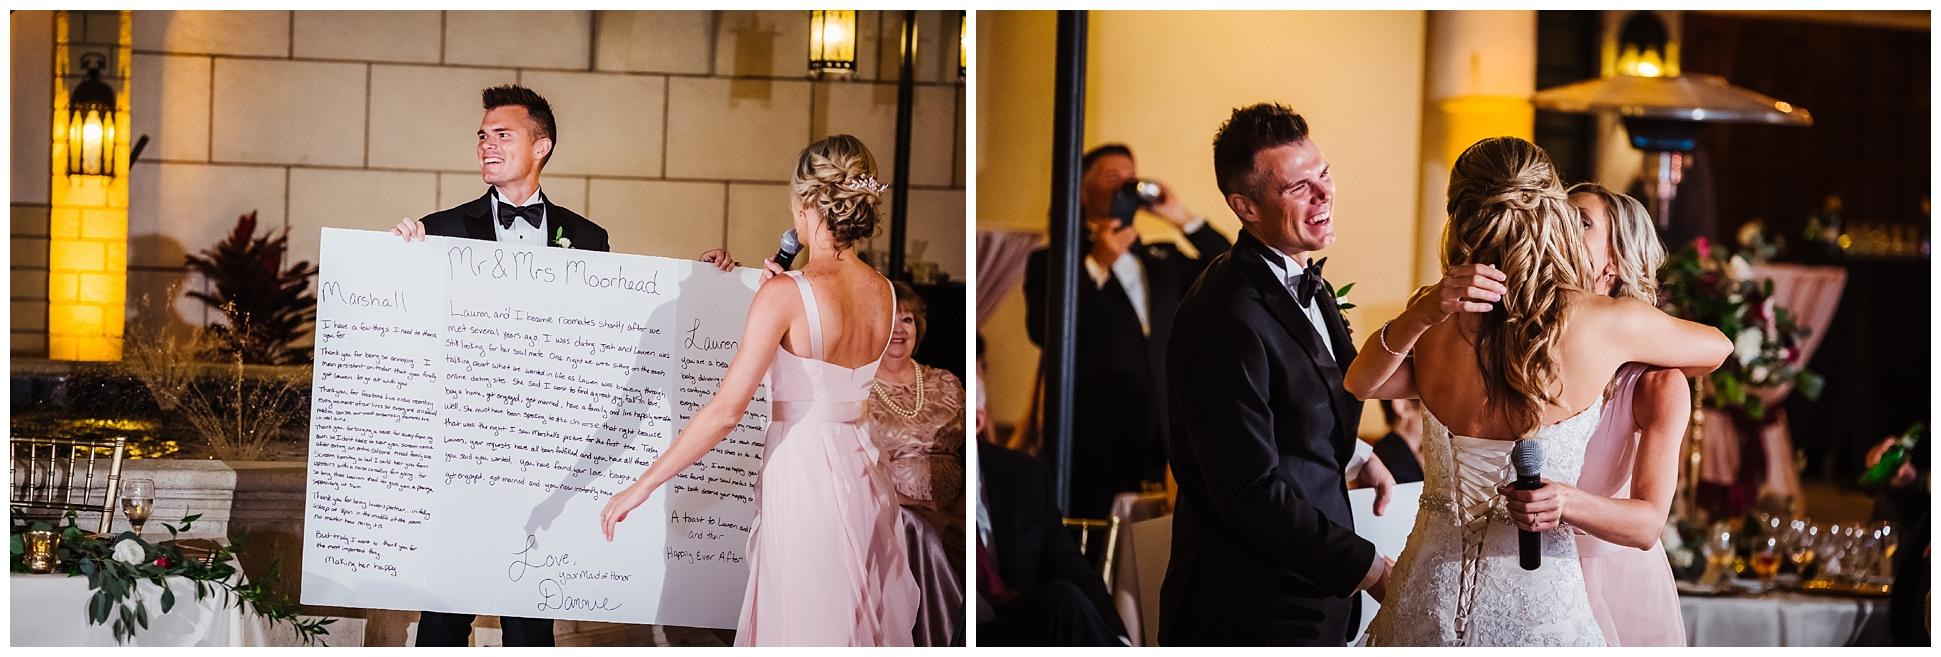 tampa-bradenton-wedding-photographer-south-florida-museum-classic-blush-gold-alpacas-sparklers_0081.jpg